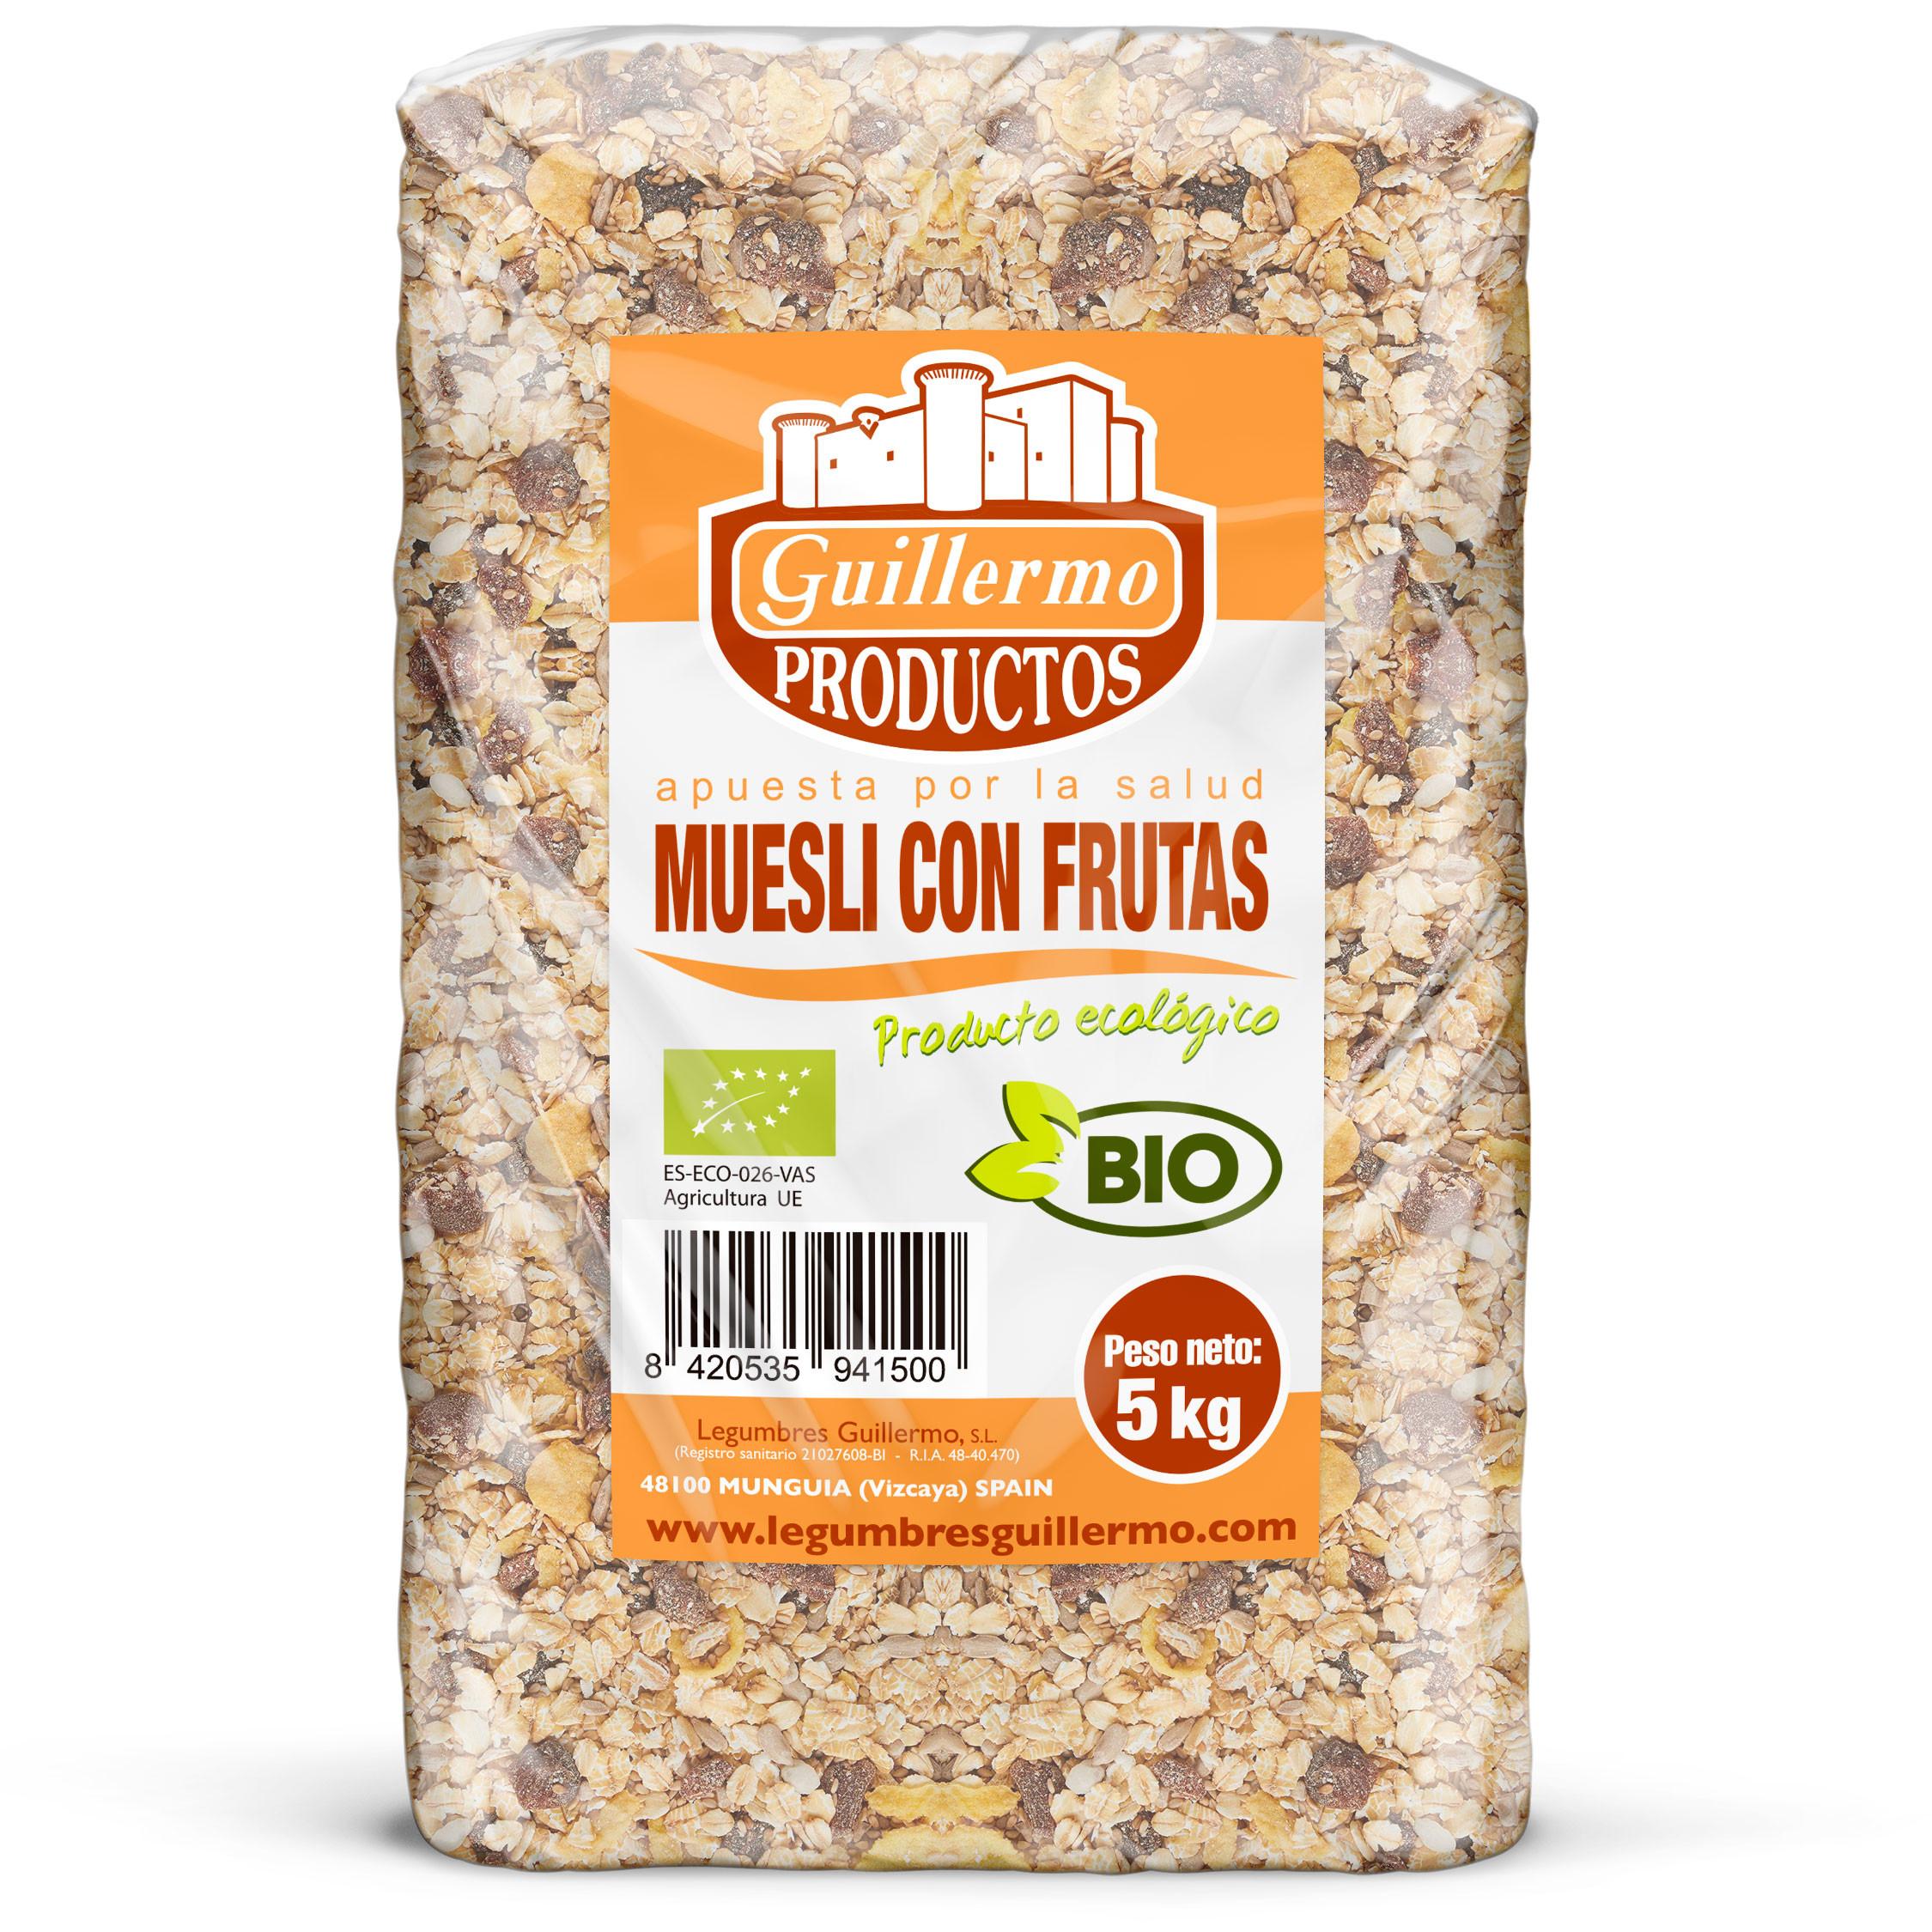 Guillermo Horeca Mueslis con Frutas Ecológicos BIO Granel Superalimento 100% Natural 5kg